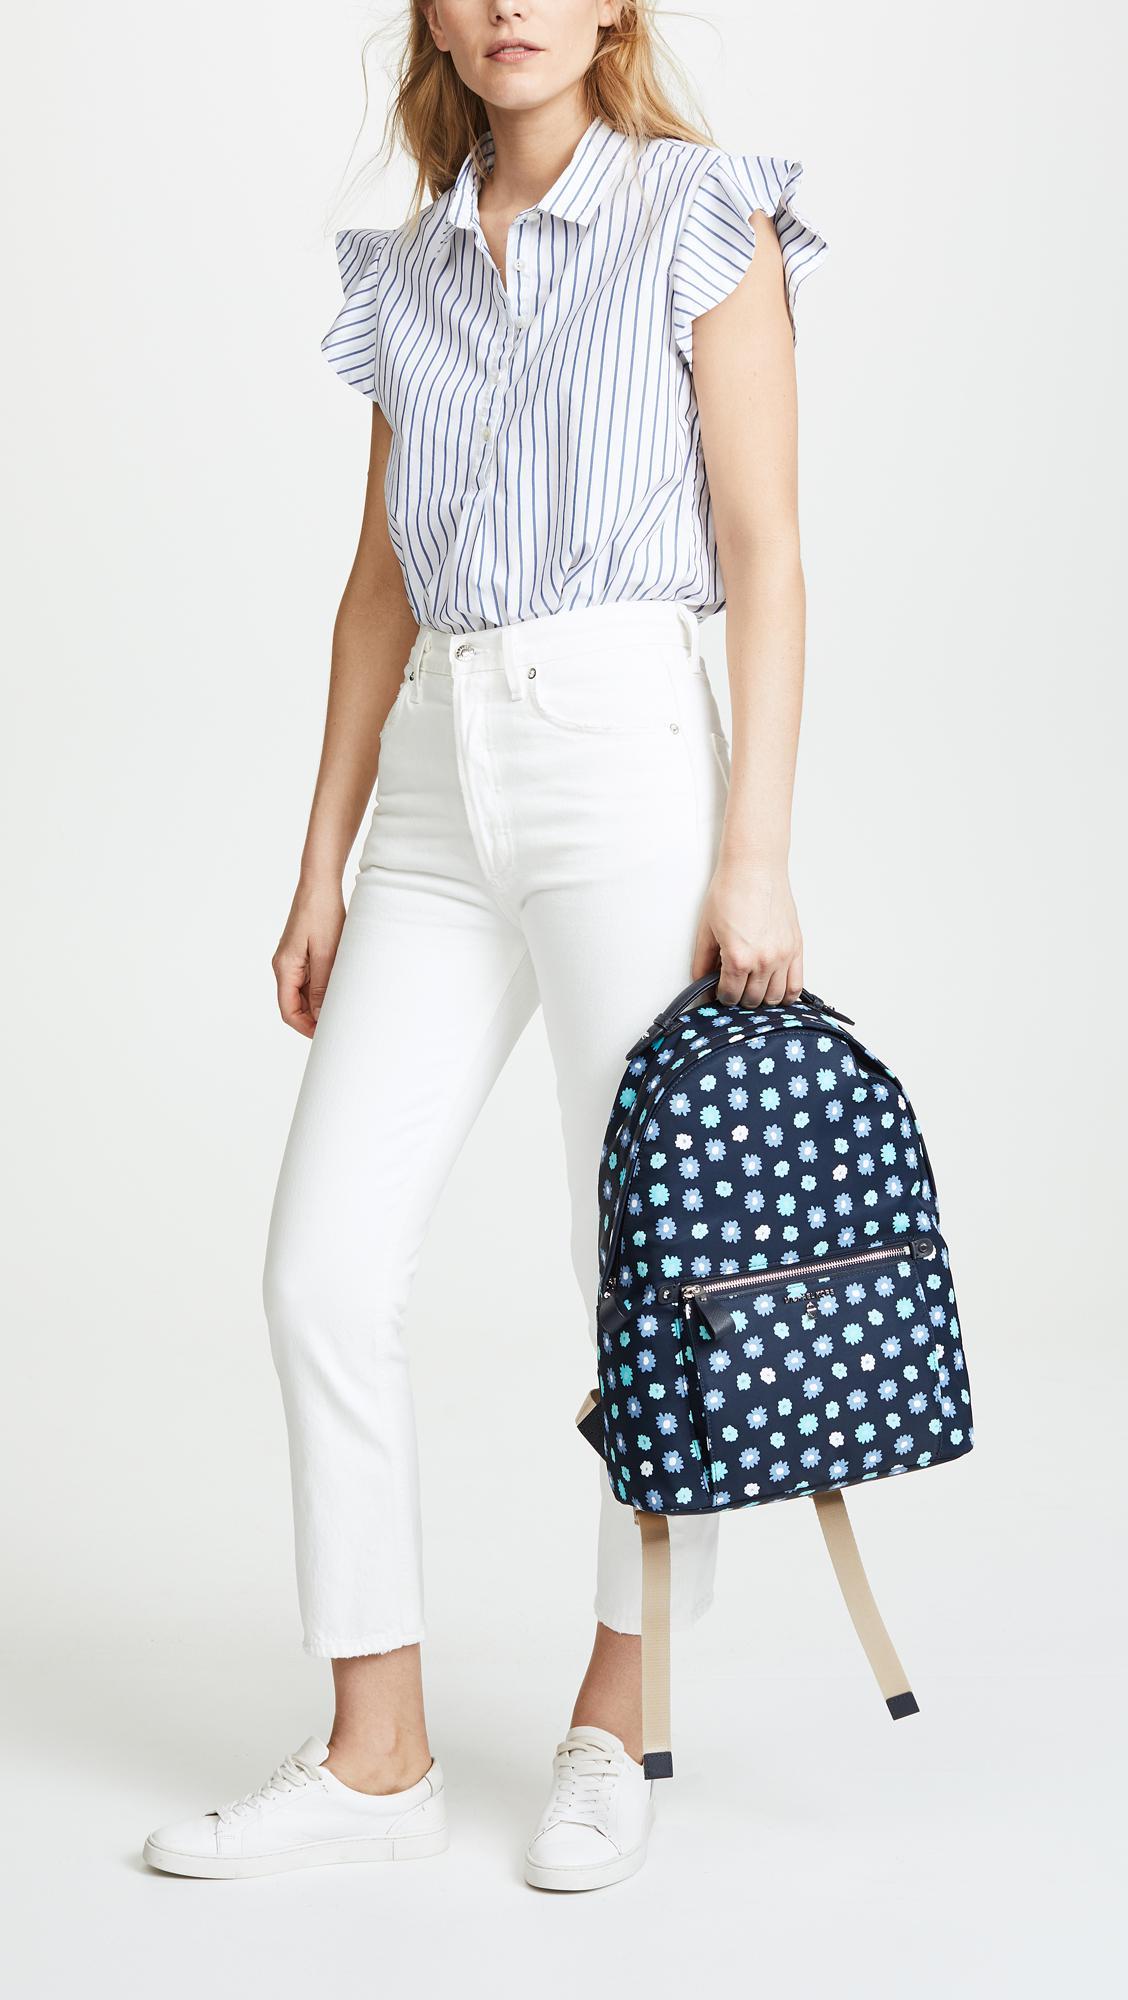 MICHAEL Michael Kors Synthetic Nylon Kelsey Large Backpack in Blue